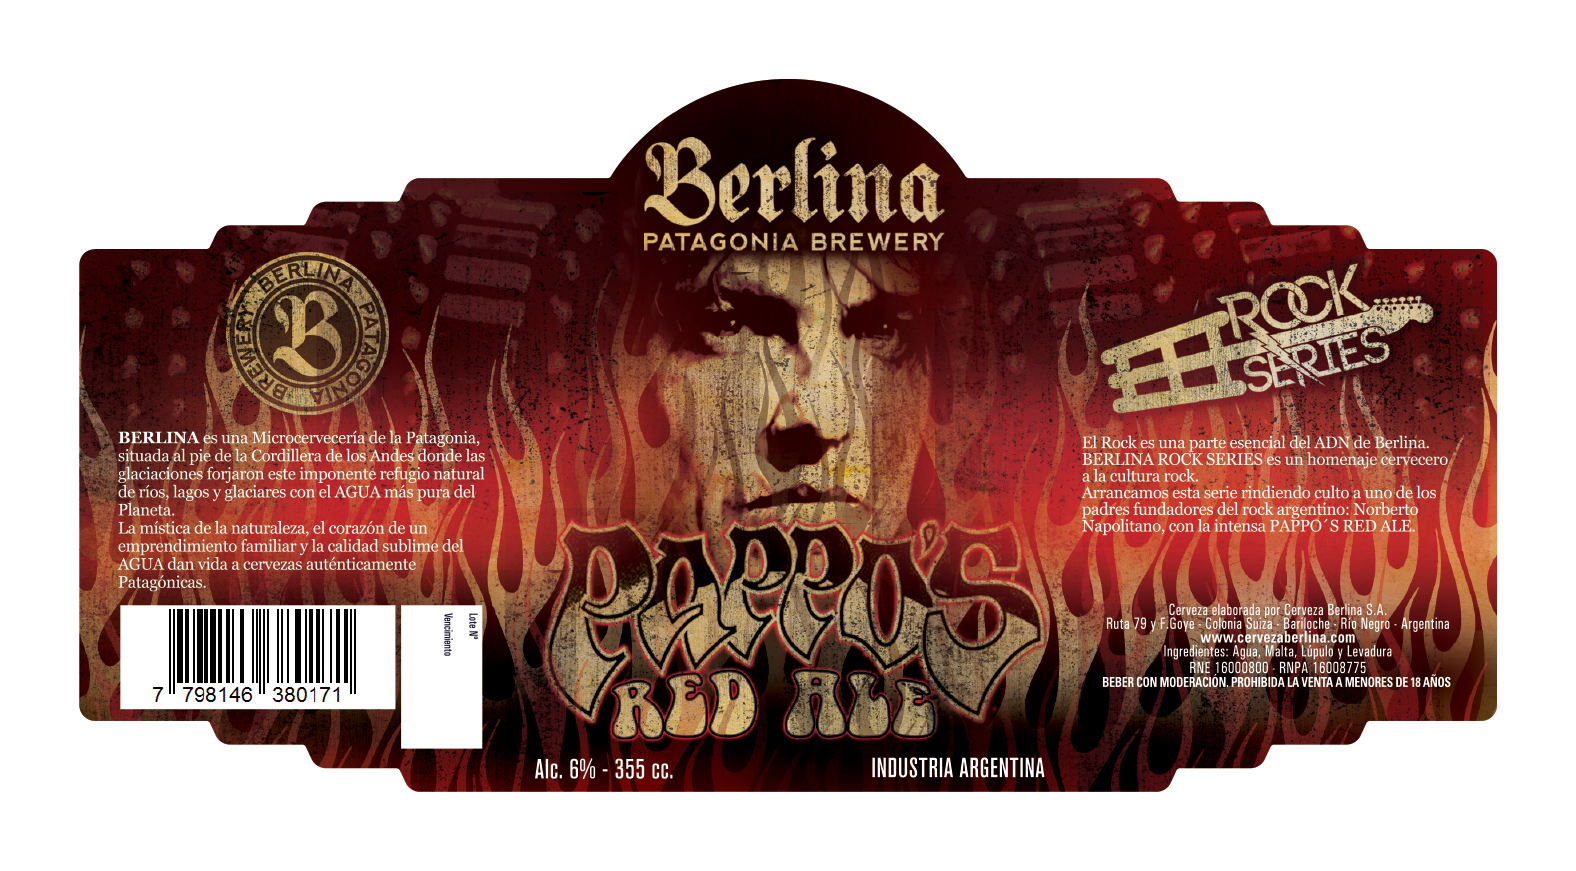 Etiqueda de Pappo's Red Ale. Imagen: Cerveza Berlina.